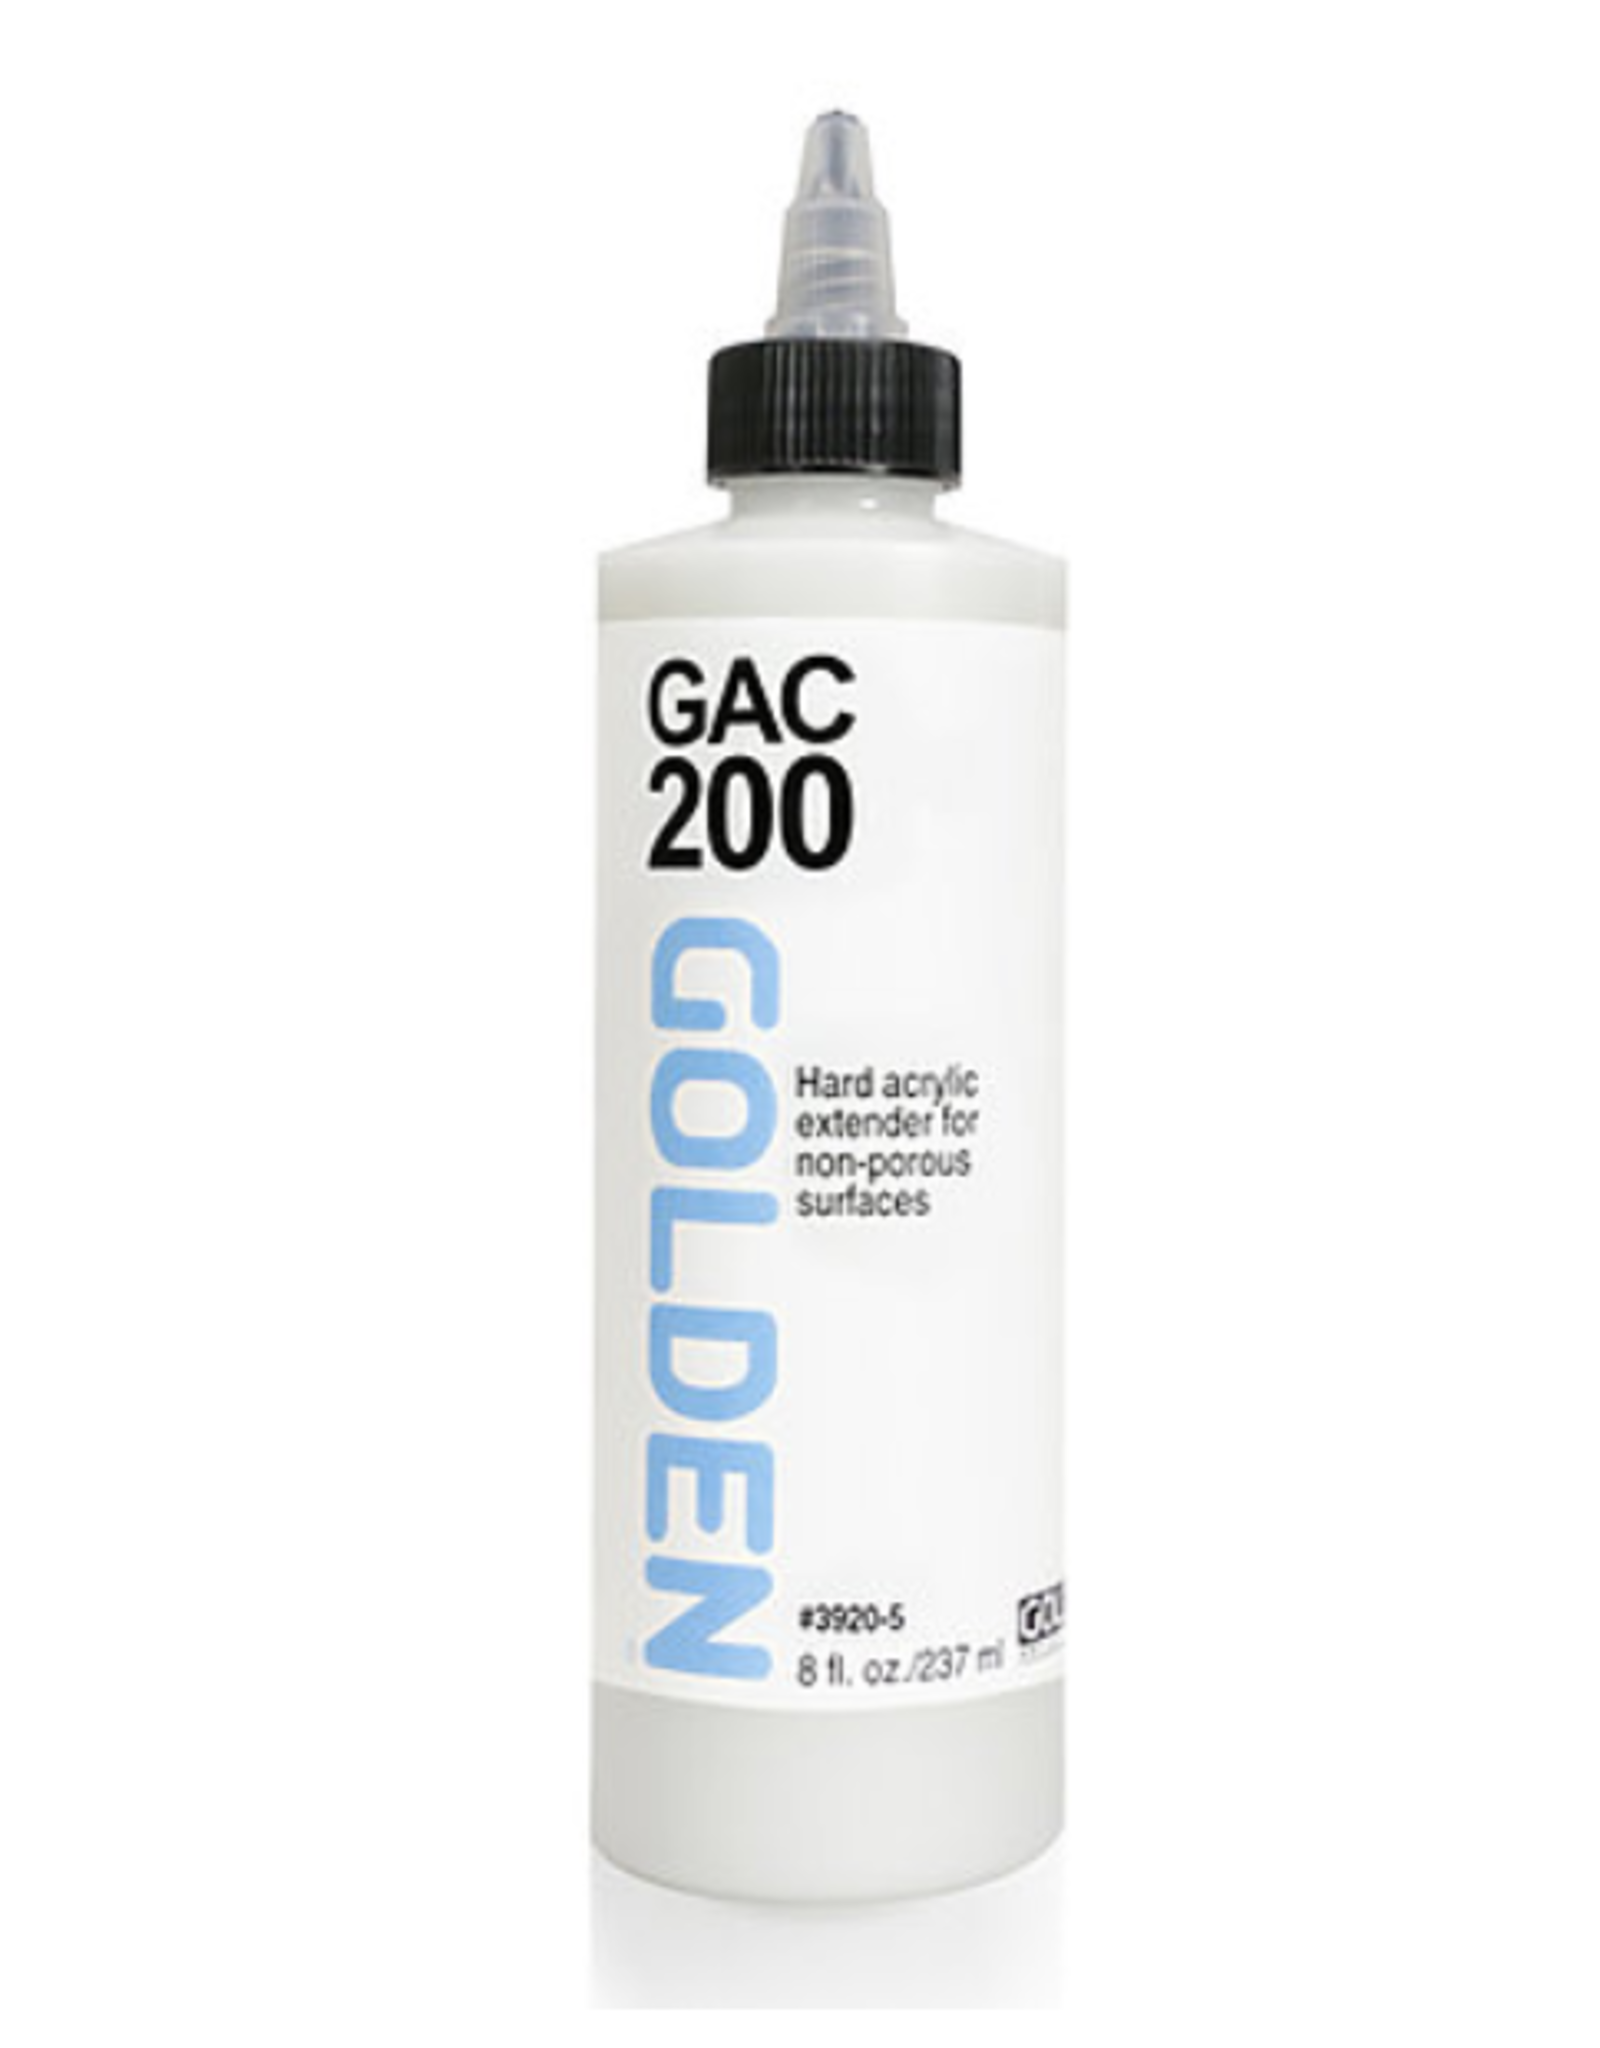 GAC 200, Golden Acrylic Polymer for Increasing Film Hardness, 16oz